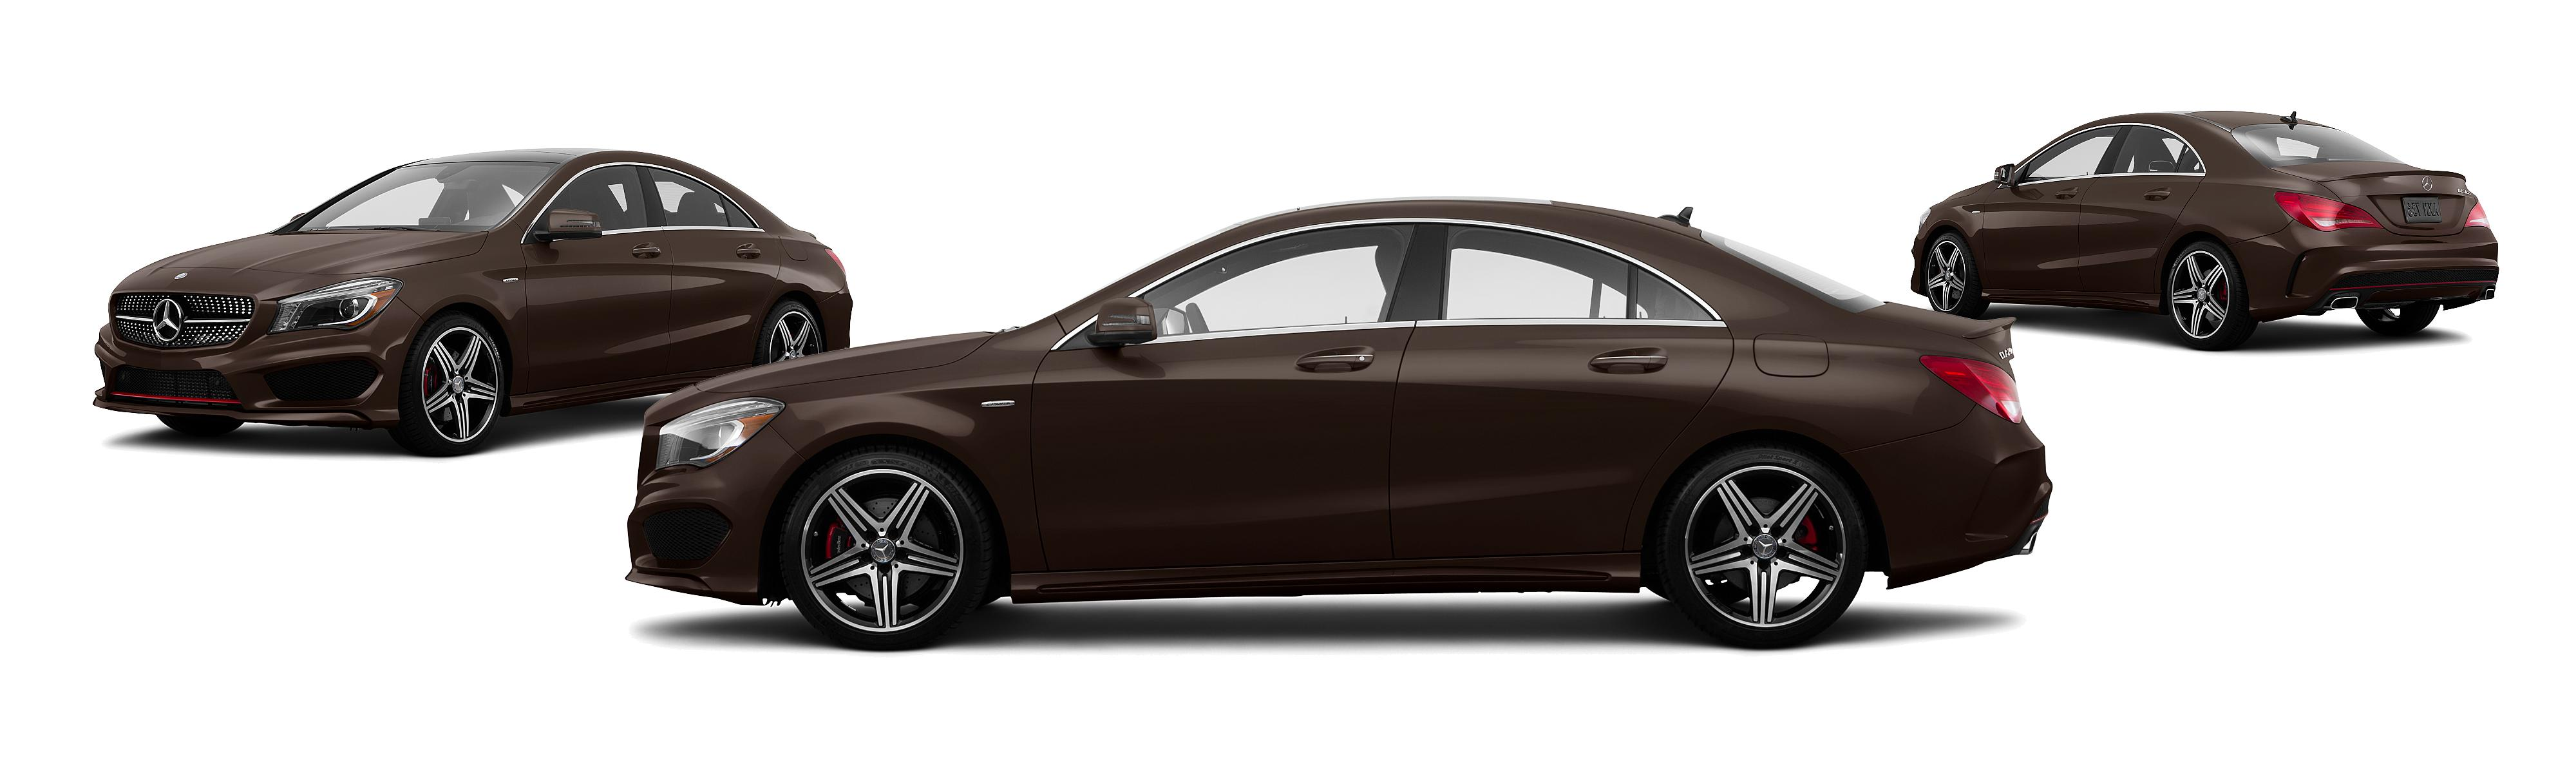 2016 Mercedes Benz CLA AWD CLA 250 4MATIC 4dr Sedan Research